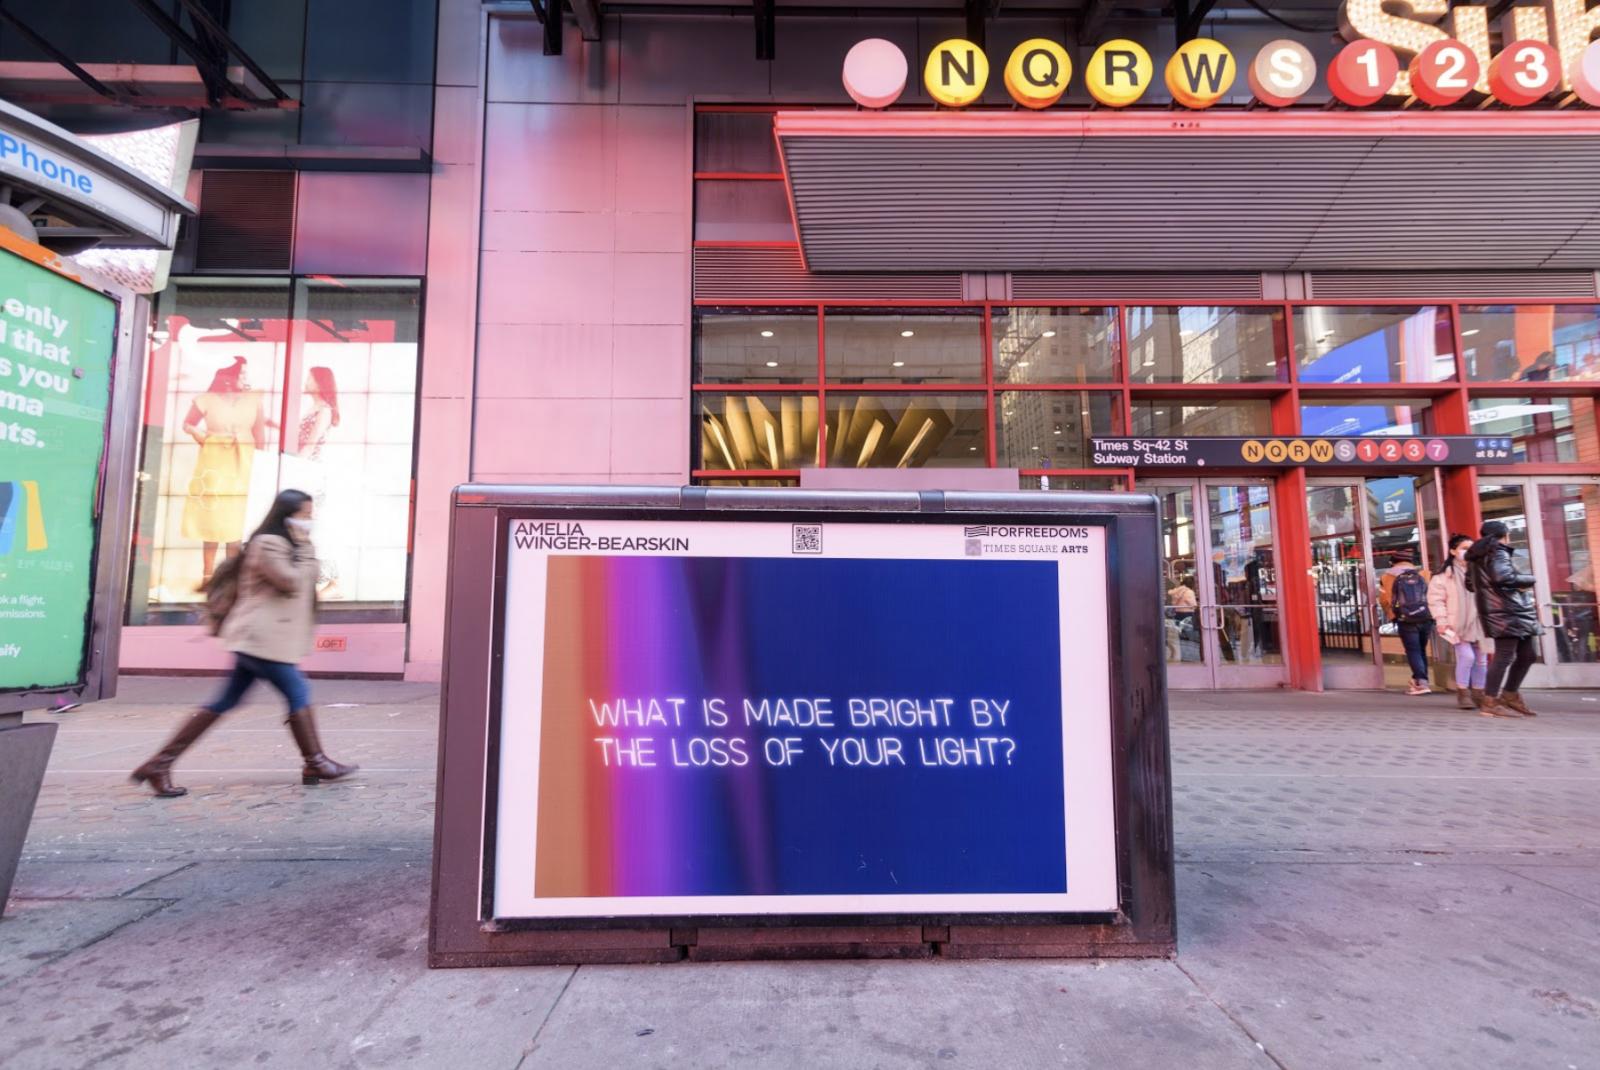 Amelia Winger-Bearskin. Photo by Ian Douglas. Courtesy of Times Square Arts.